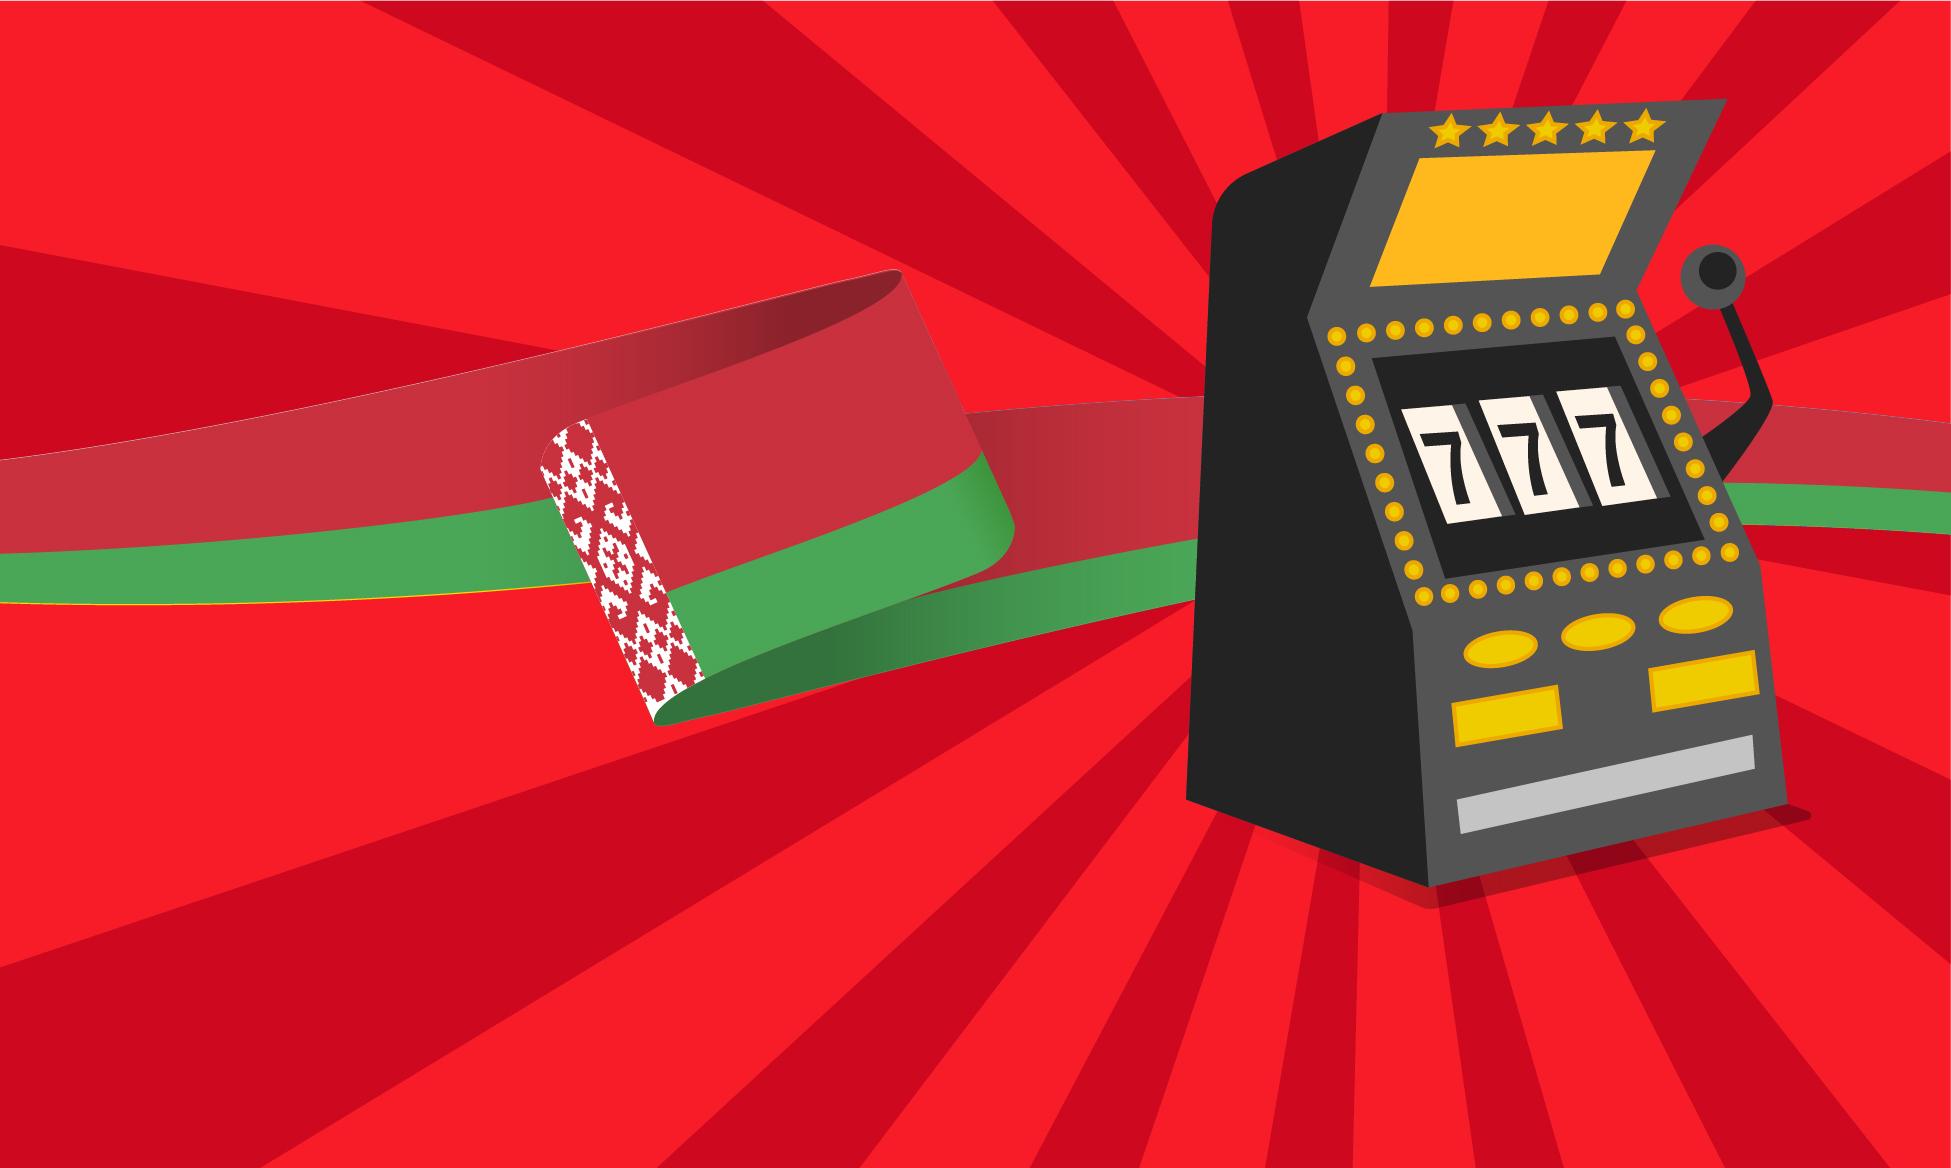 онлайн казино в белоруссии